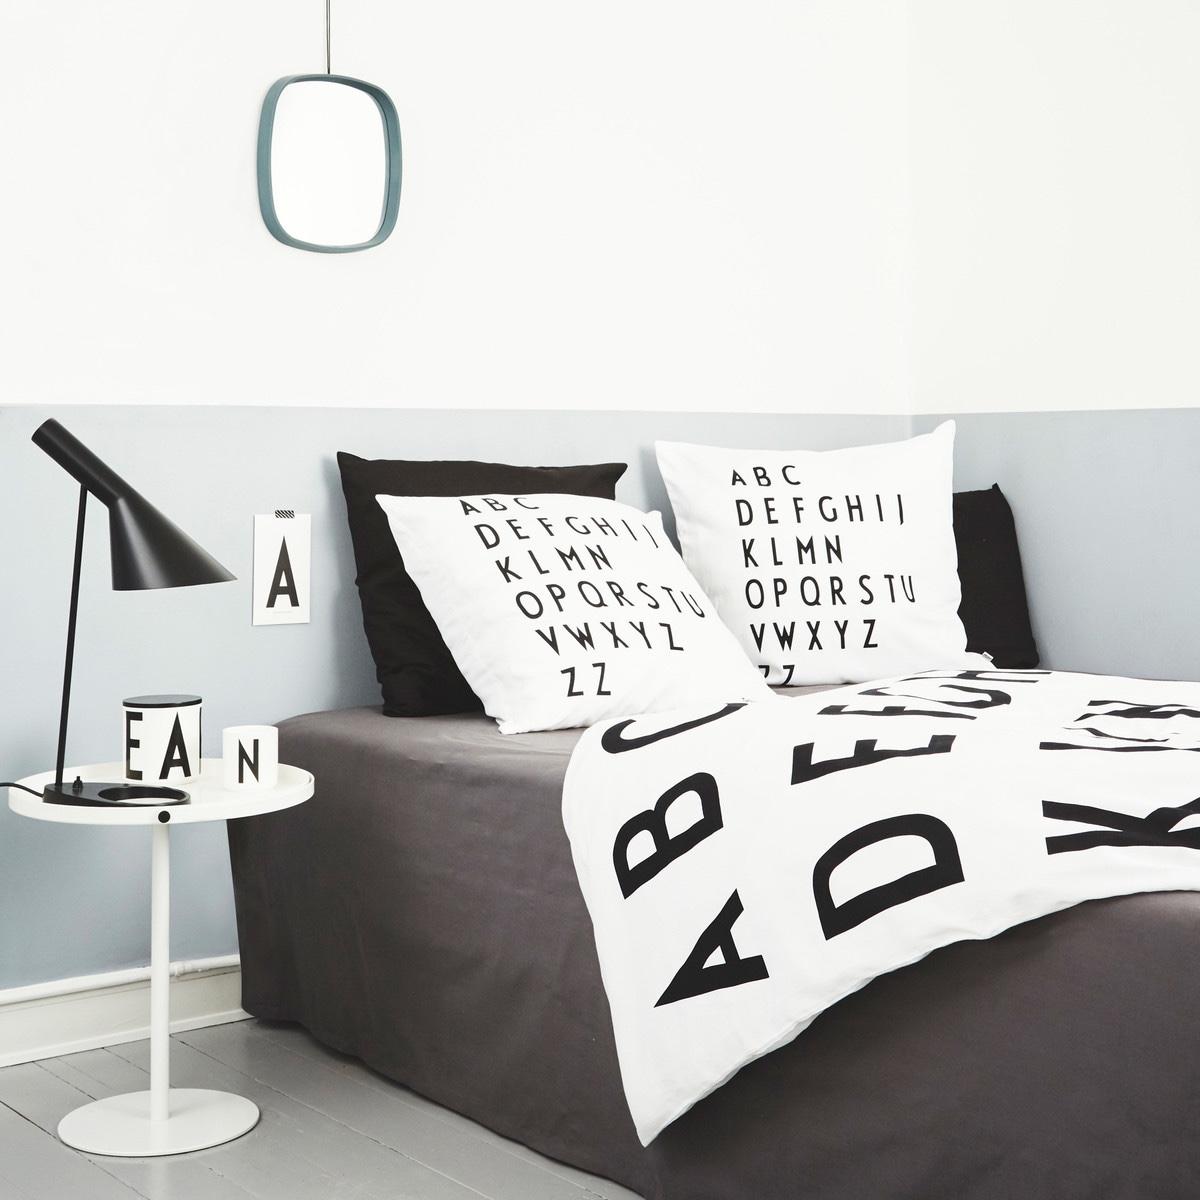 ABC bed linen